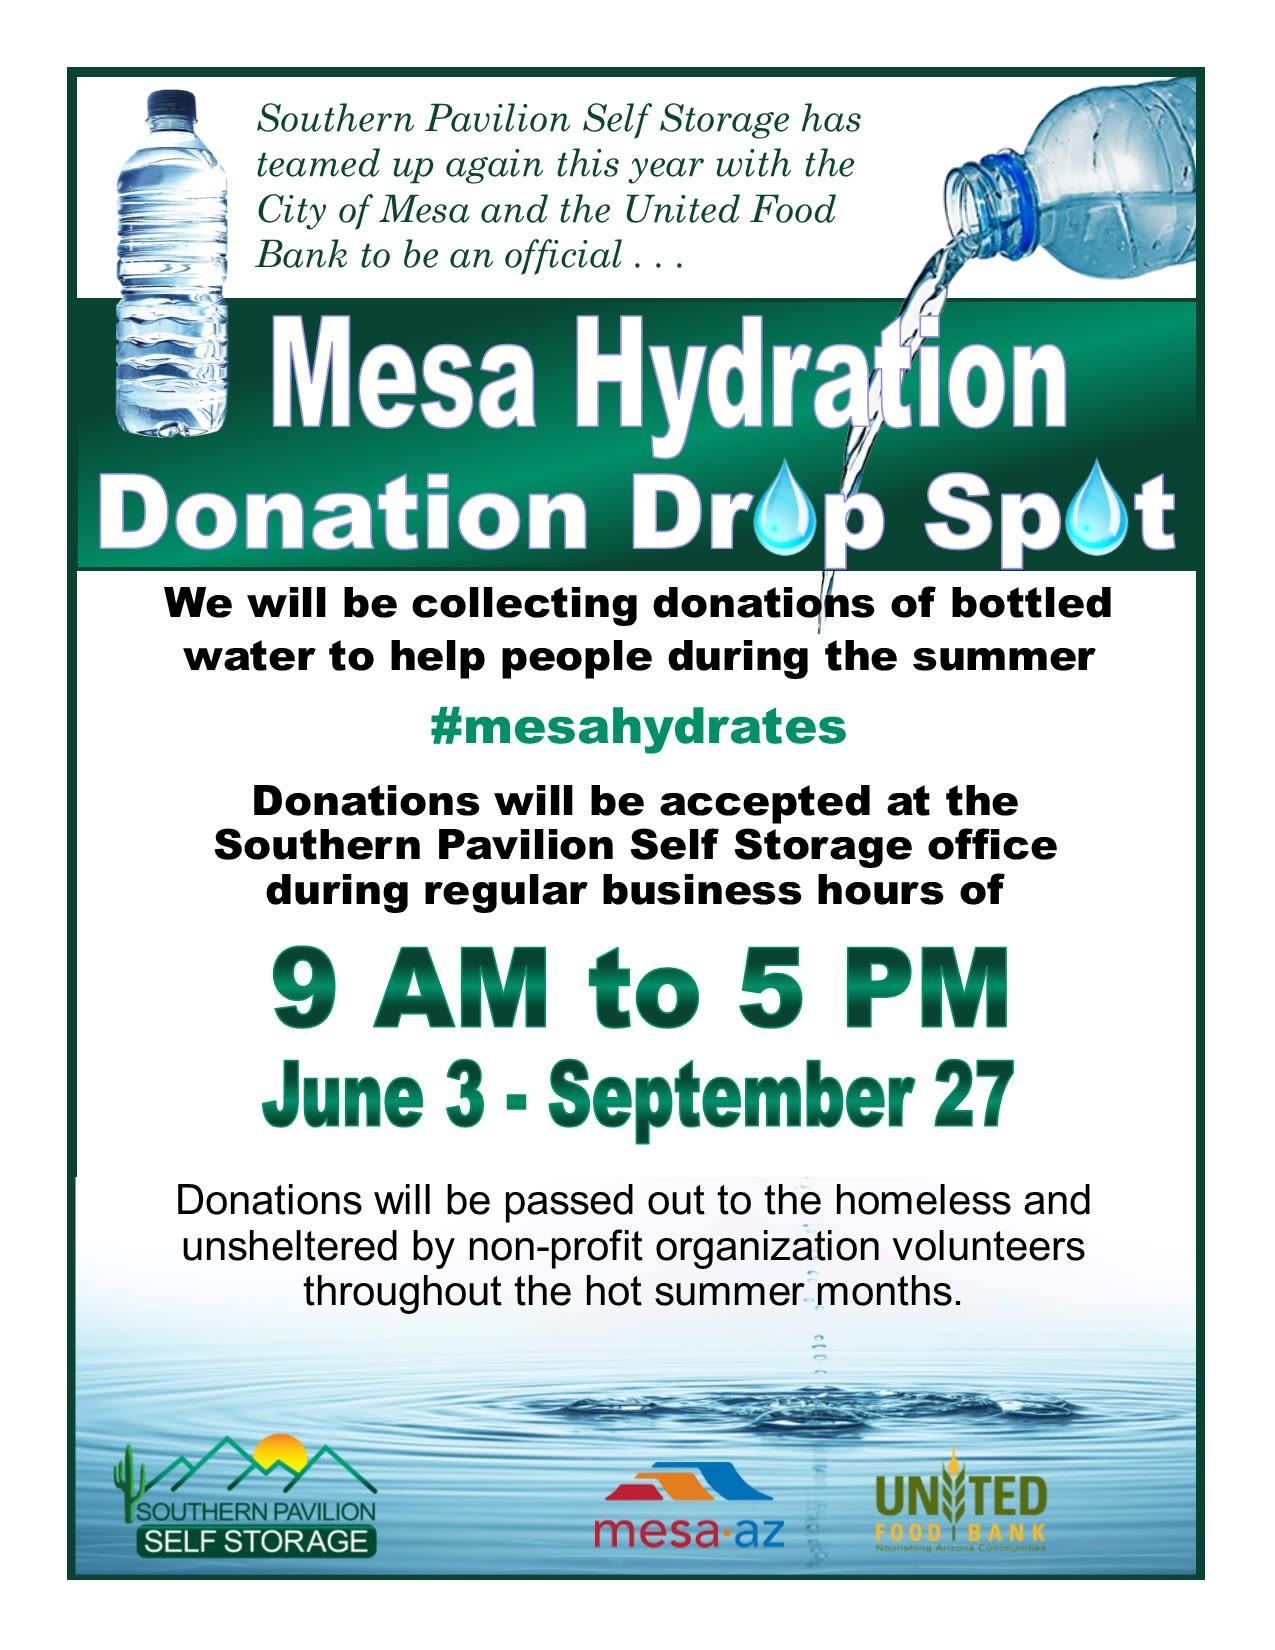 Mesa Hydration Campaign 2019